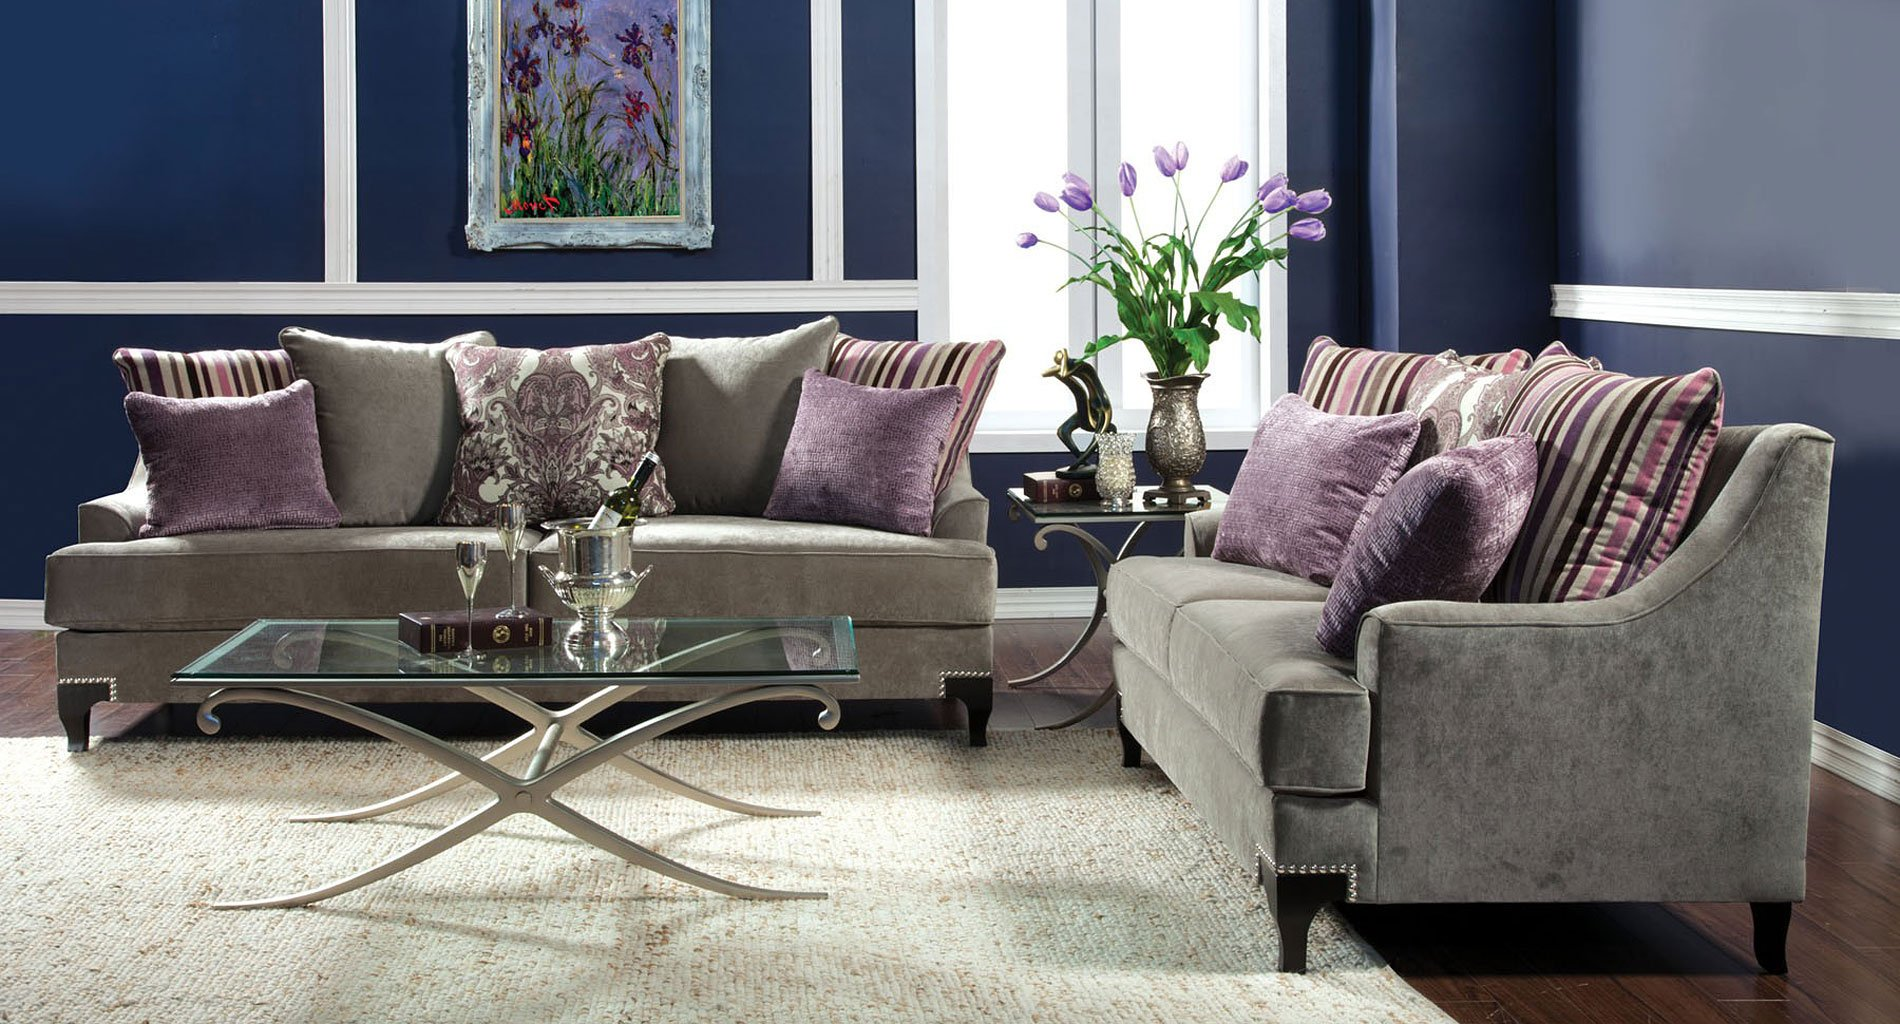 Viscontti Living Room Set Gray Furniture Of America 1 Reviews Furniture Cart